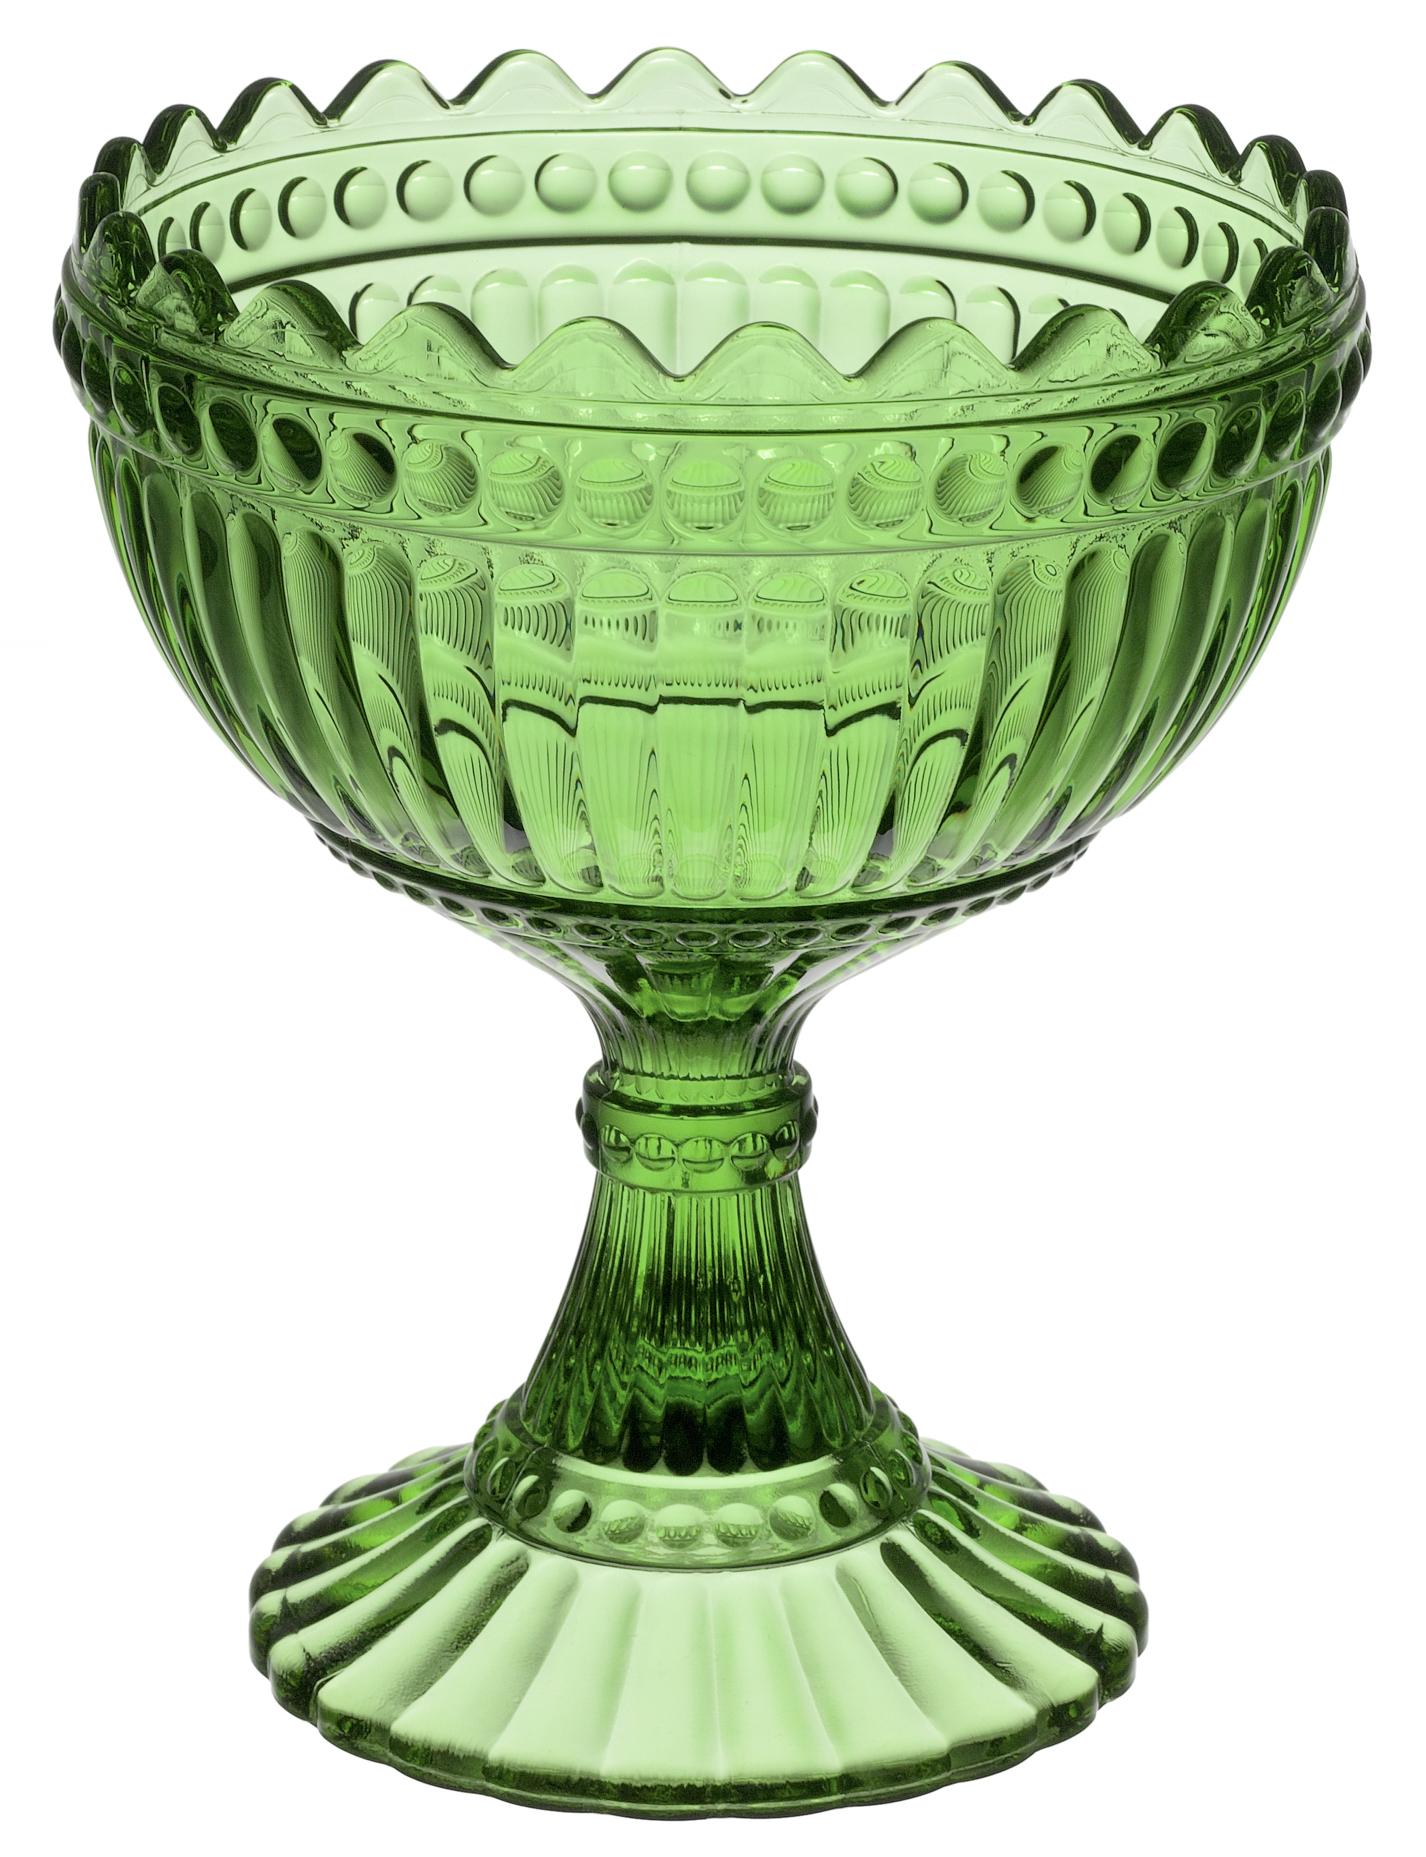 Marimekko Skål på fot 15 cm Grön